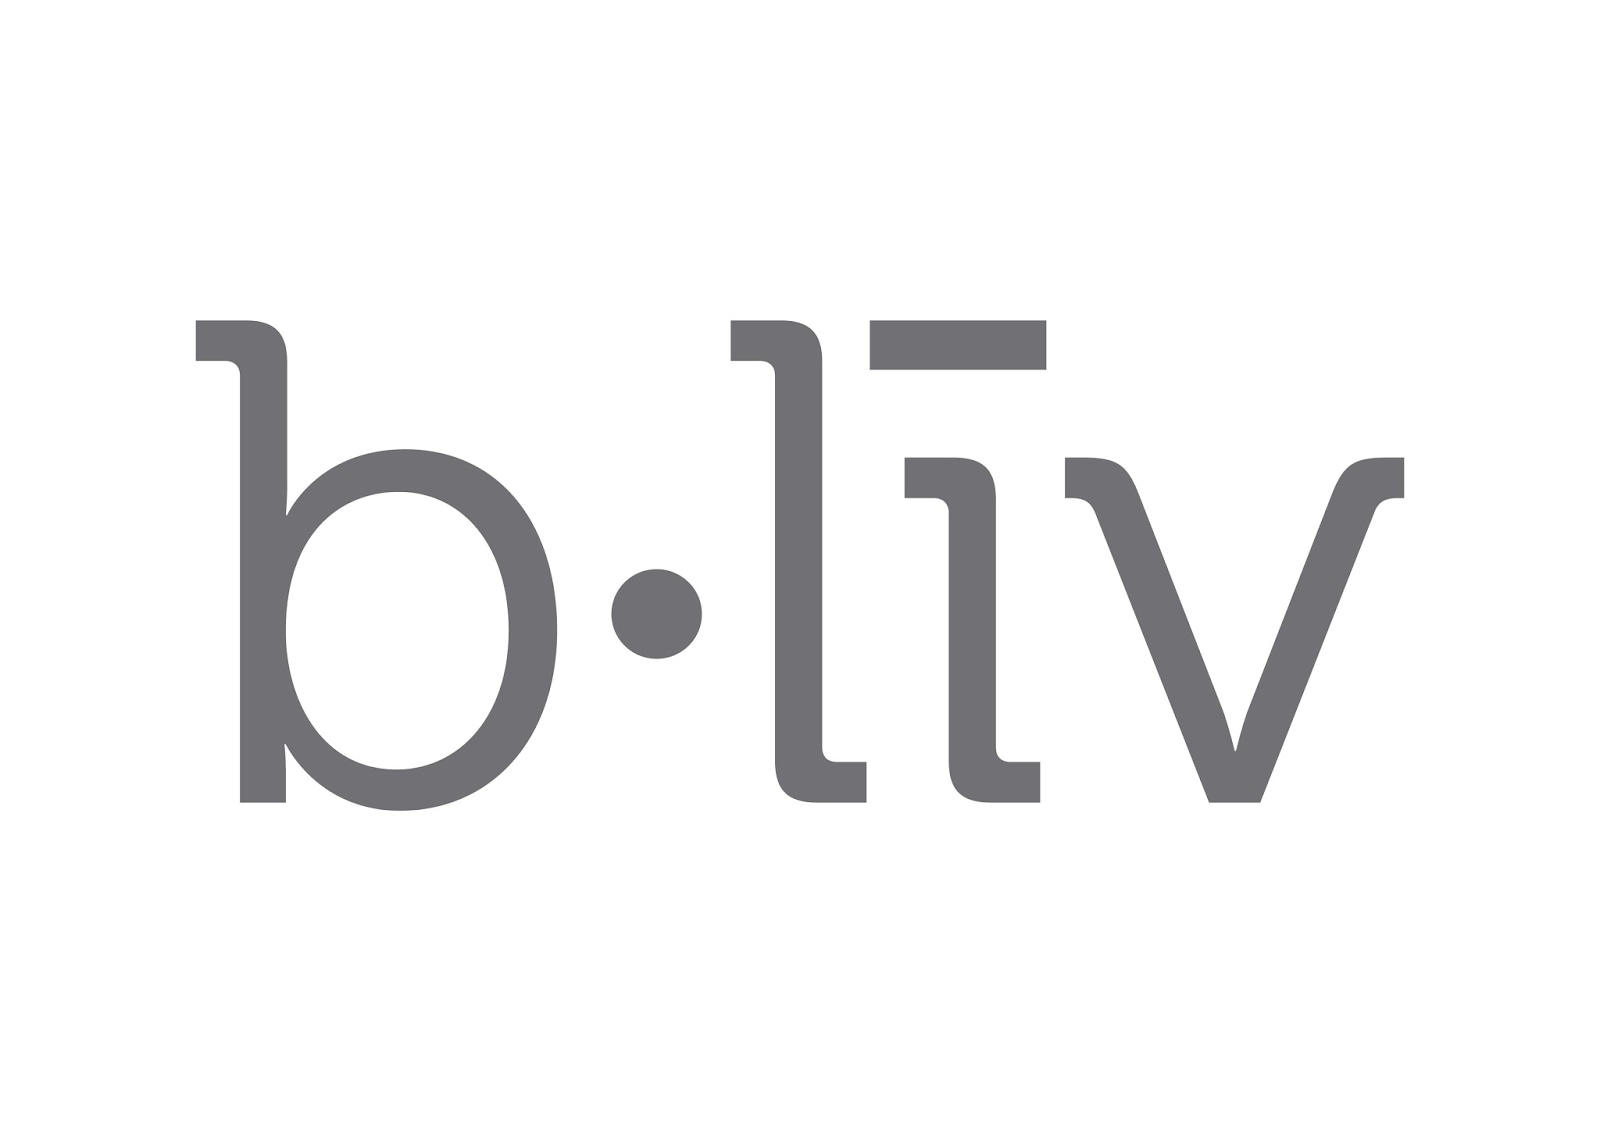 bliv (My)